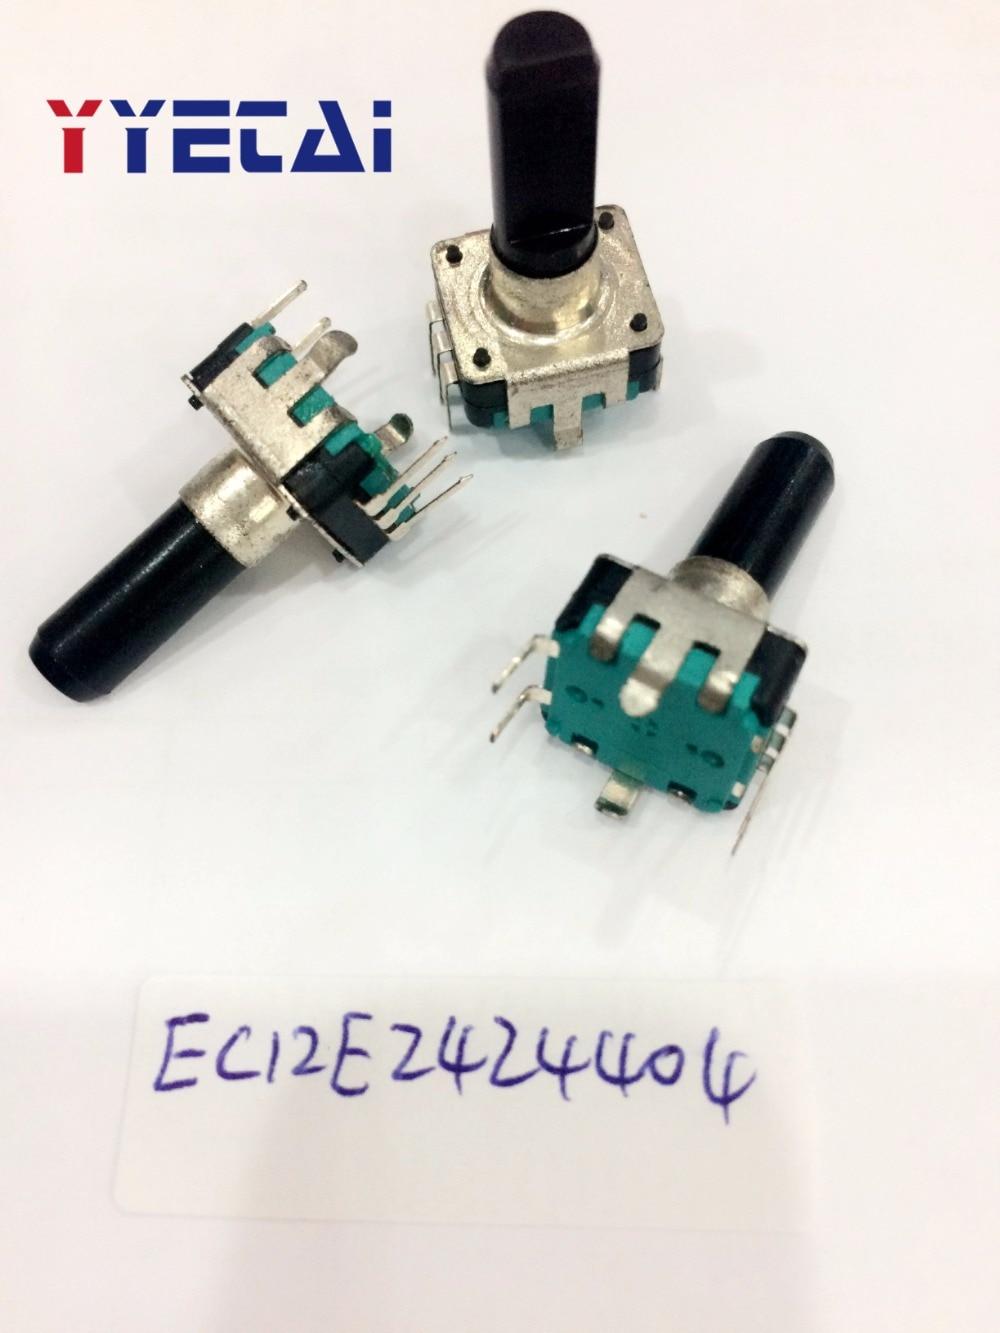 Potentiometer Wiring Diagram Also 5mm Female Audio Jack Wiring Diagram